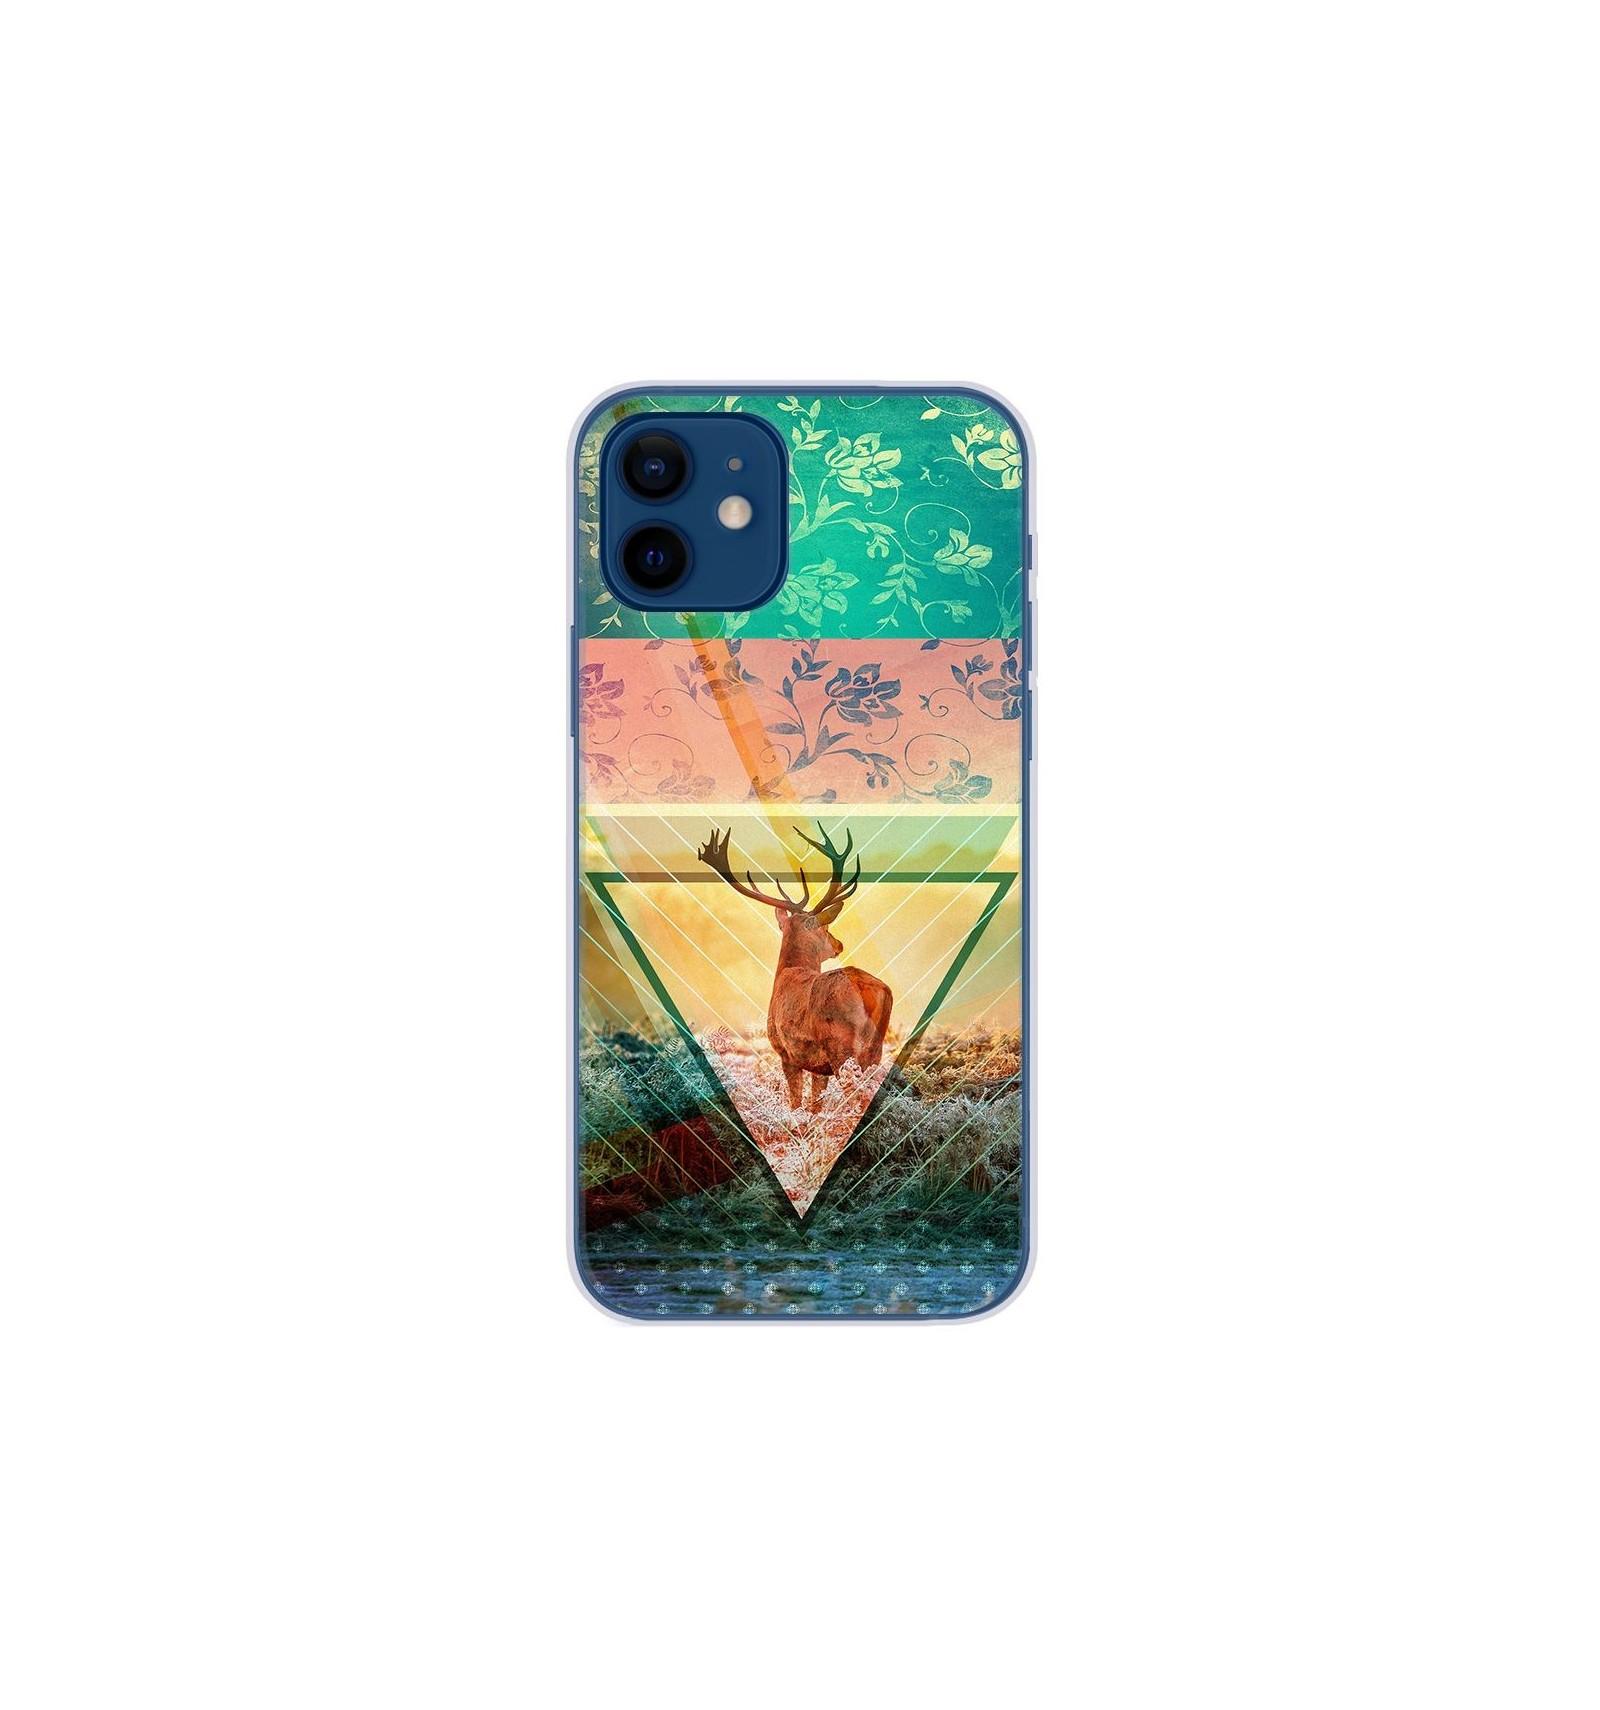 Coque en silicone Apple iPhone 12 - Cerf swag